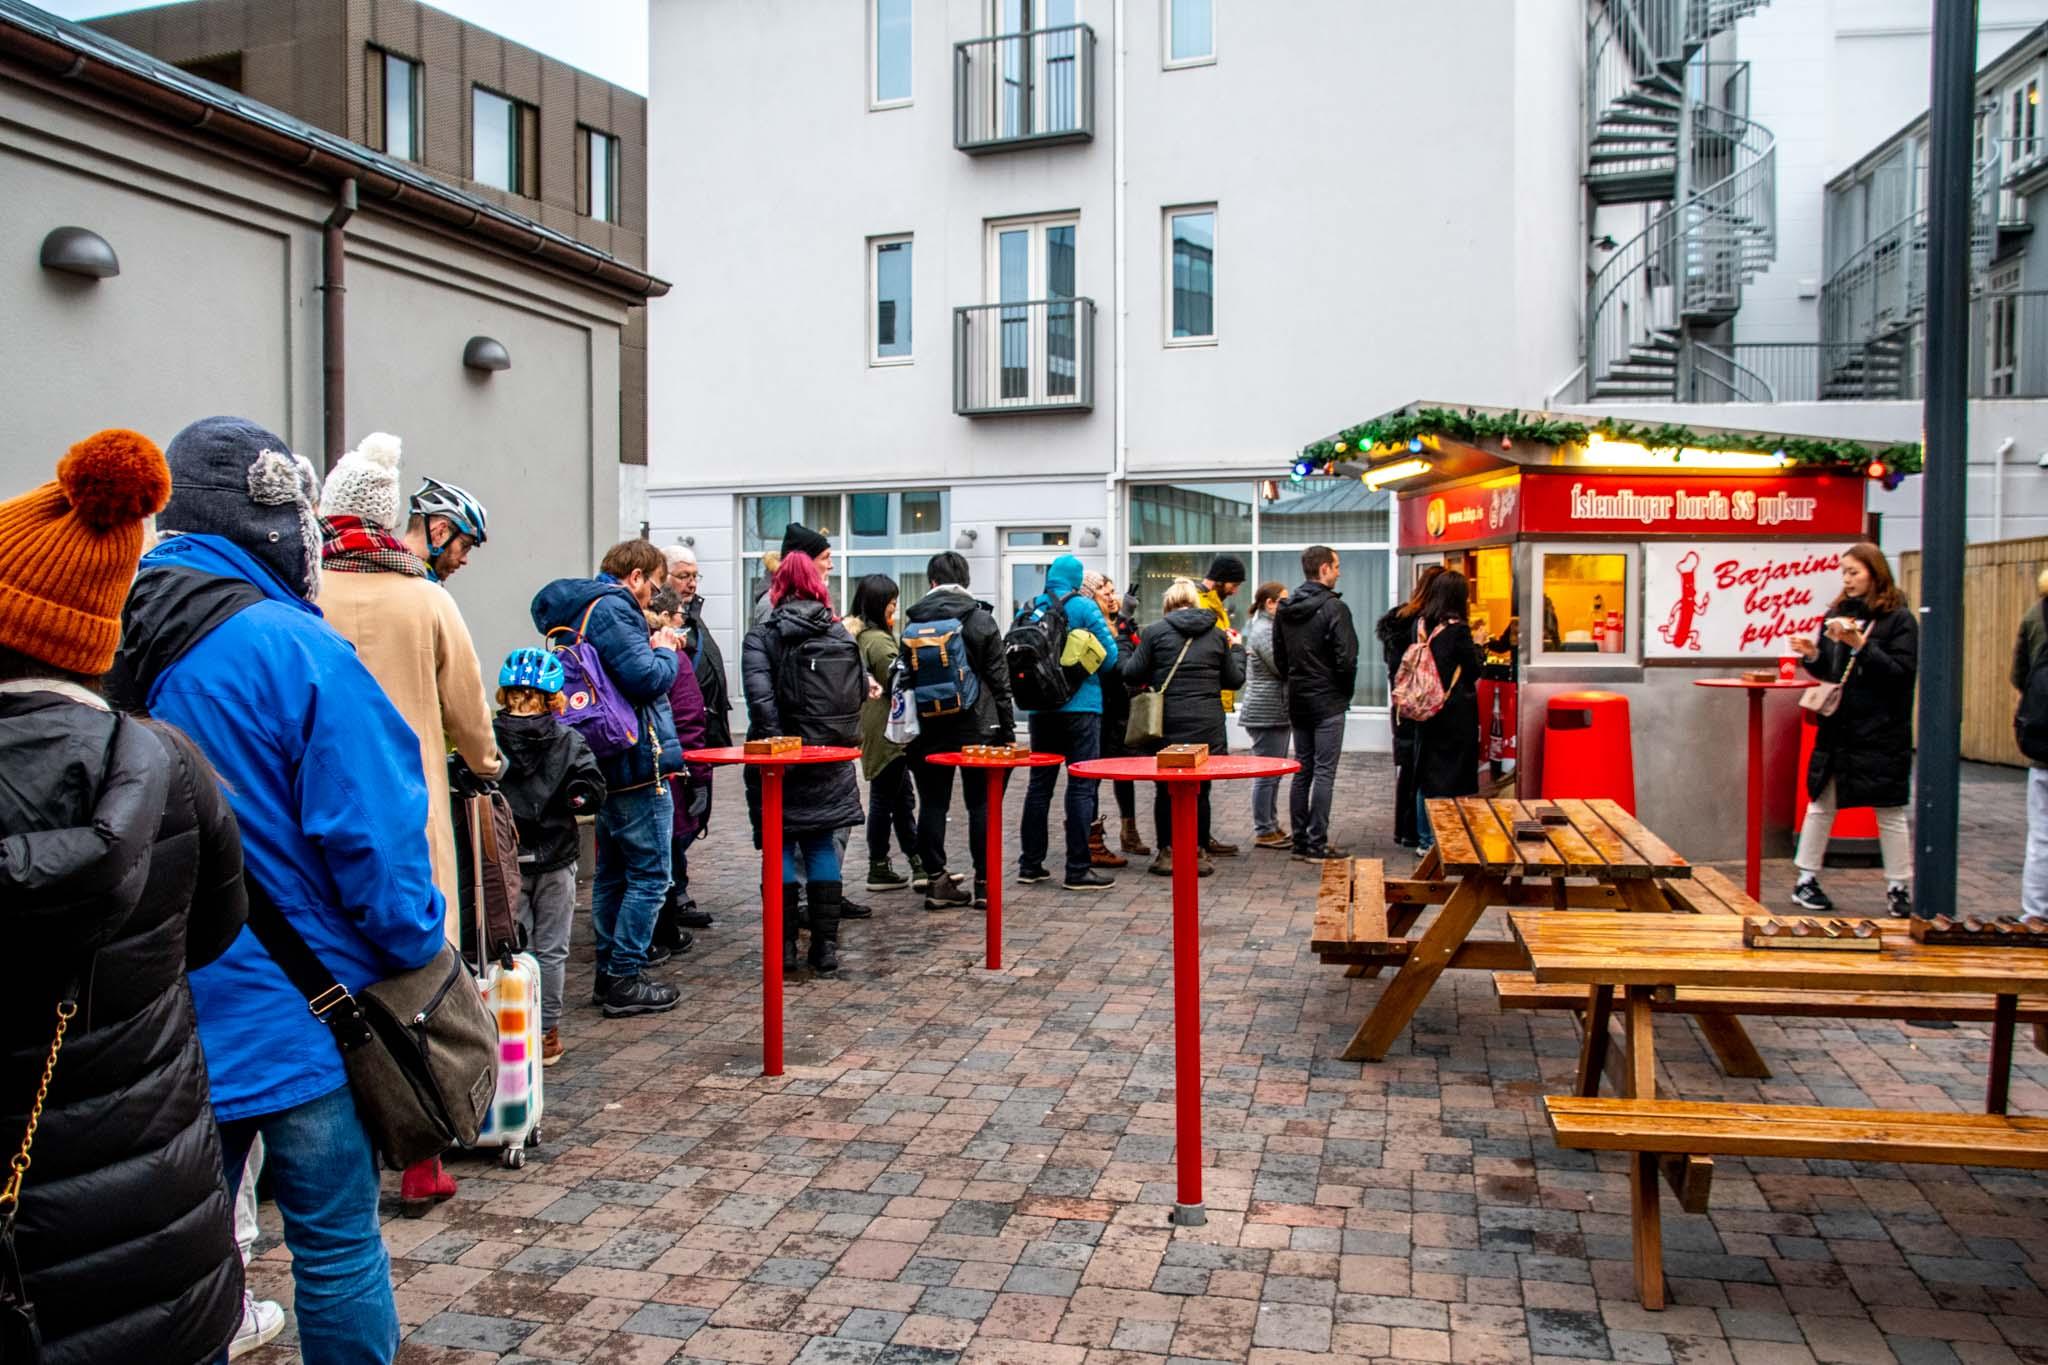 Long customer line at the Bæjarins Beztu Pylsur hot dog stand